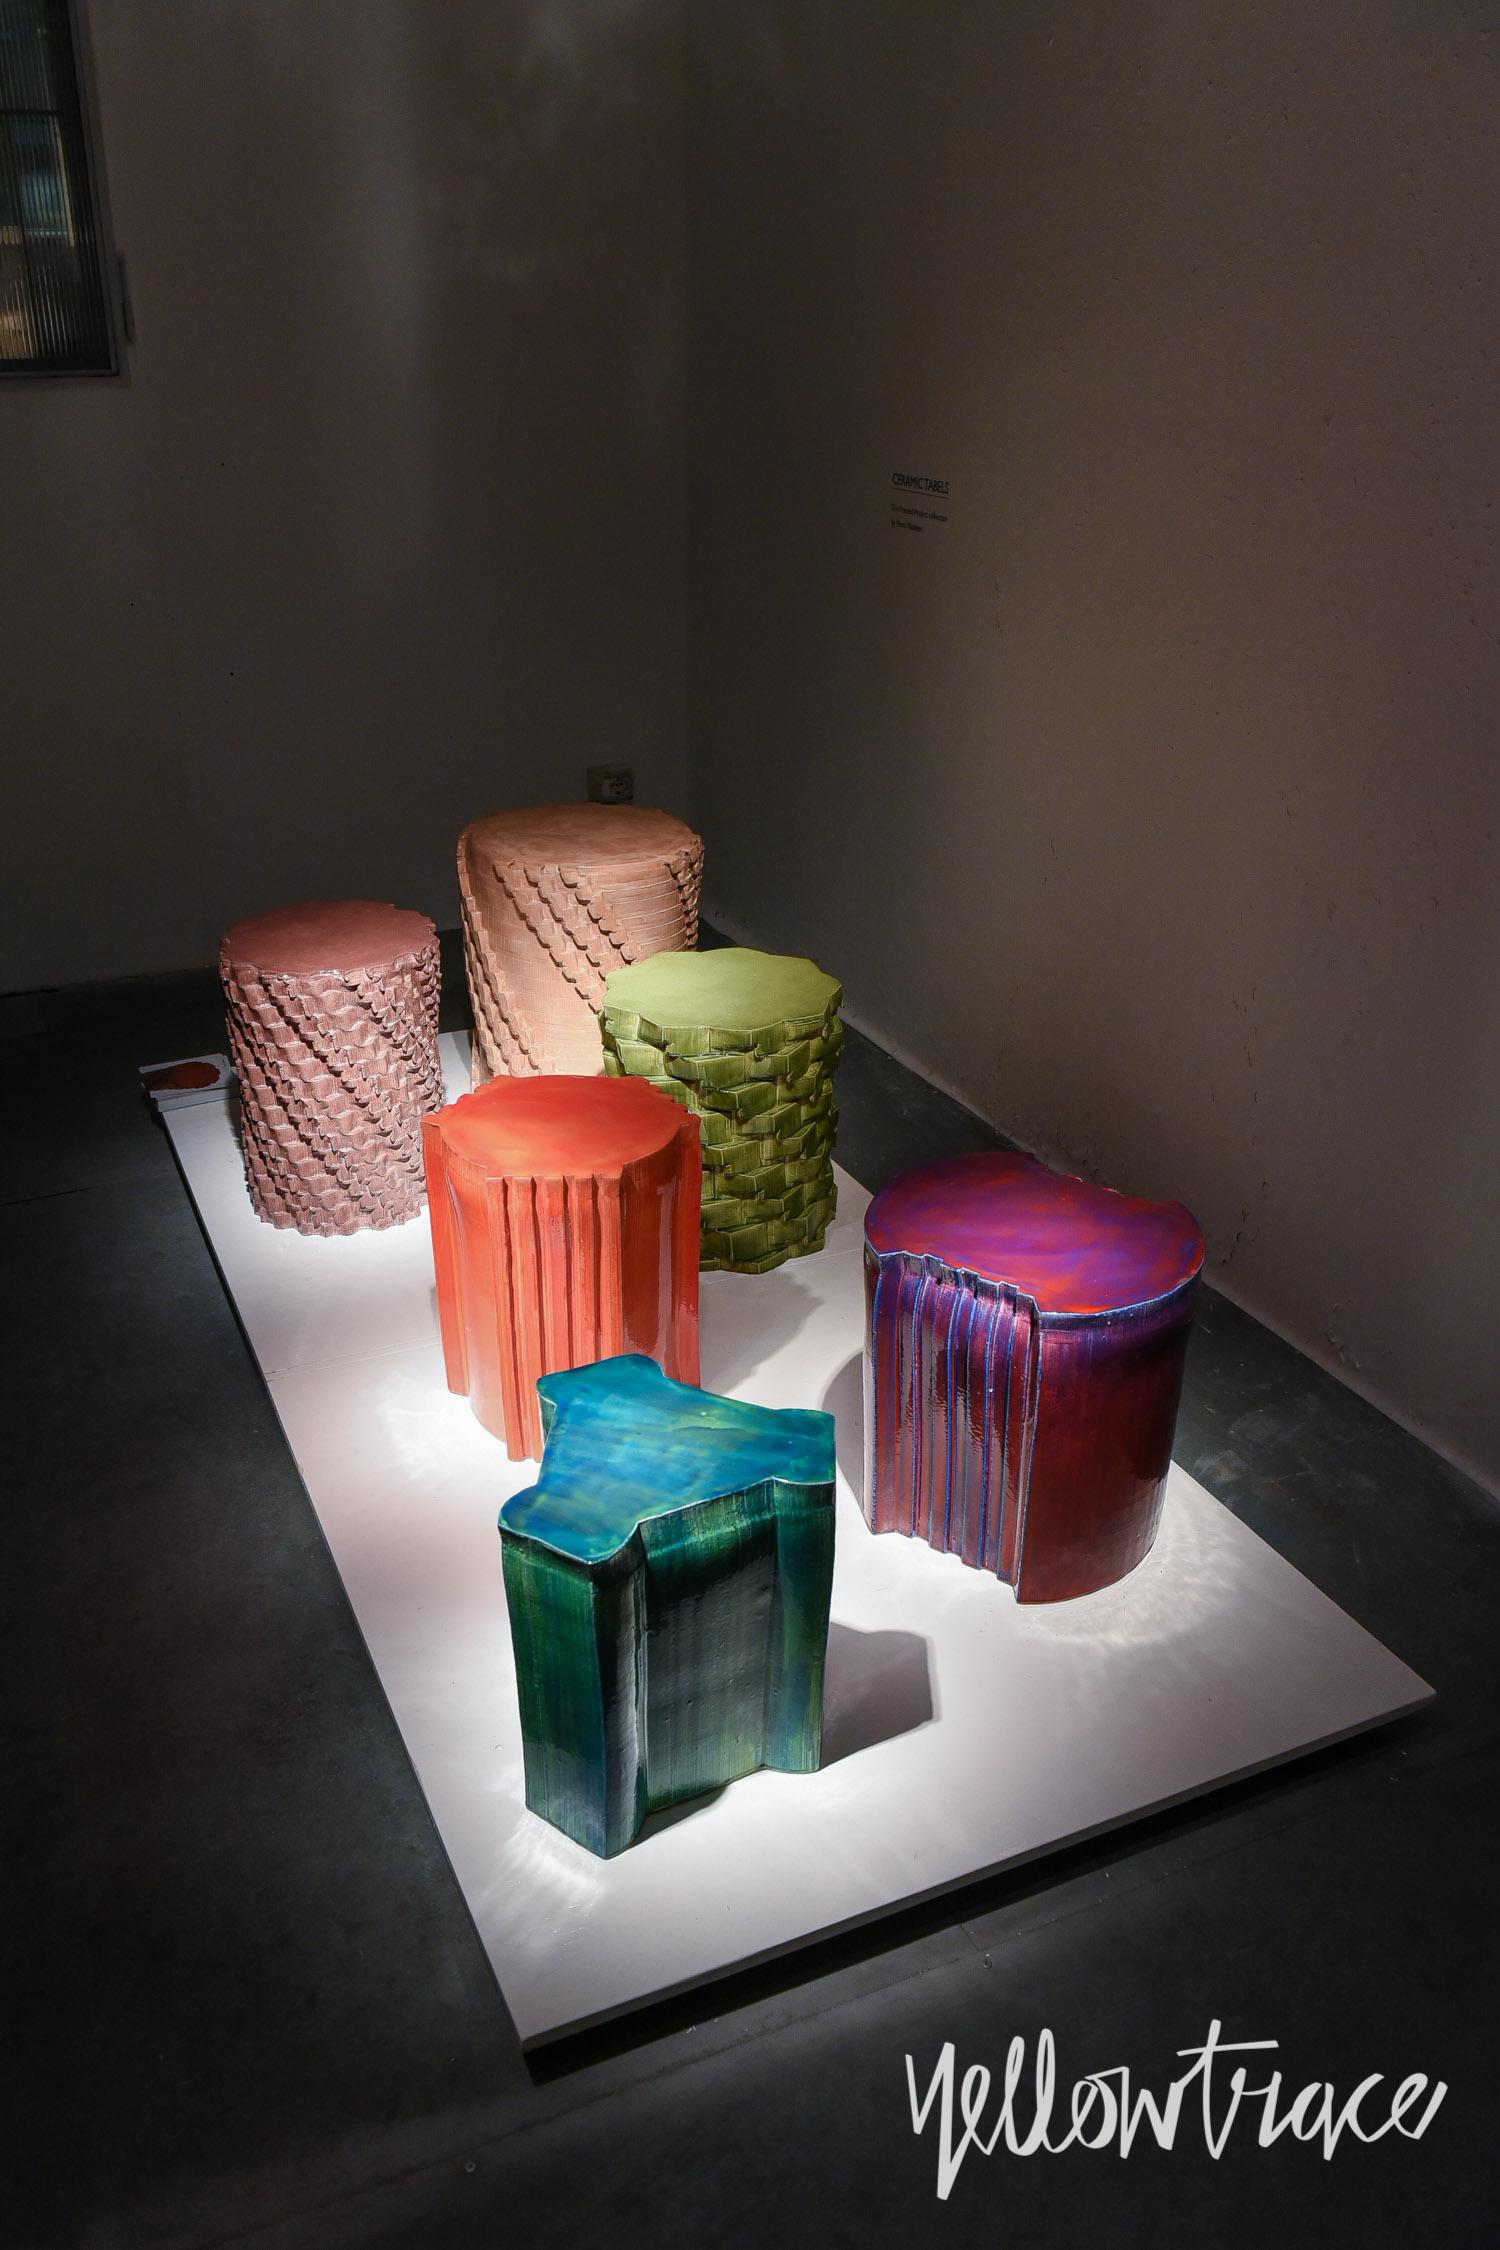 Milan Design Week 2017 Highlights, Ceramic Tables by Studio Floris Wubben at Spazio Rossana Orlandi, Photo © Nick Hughes | #Milantrace2017